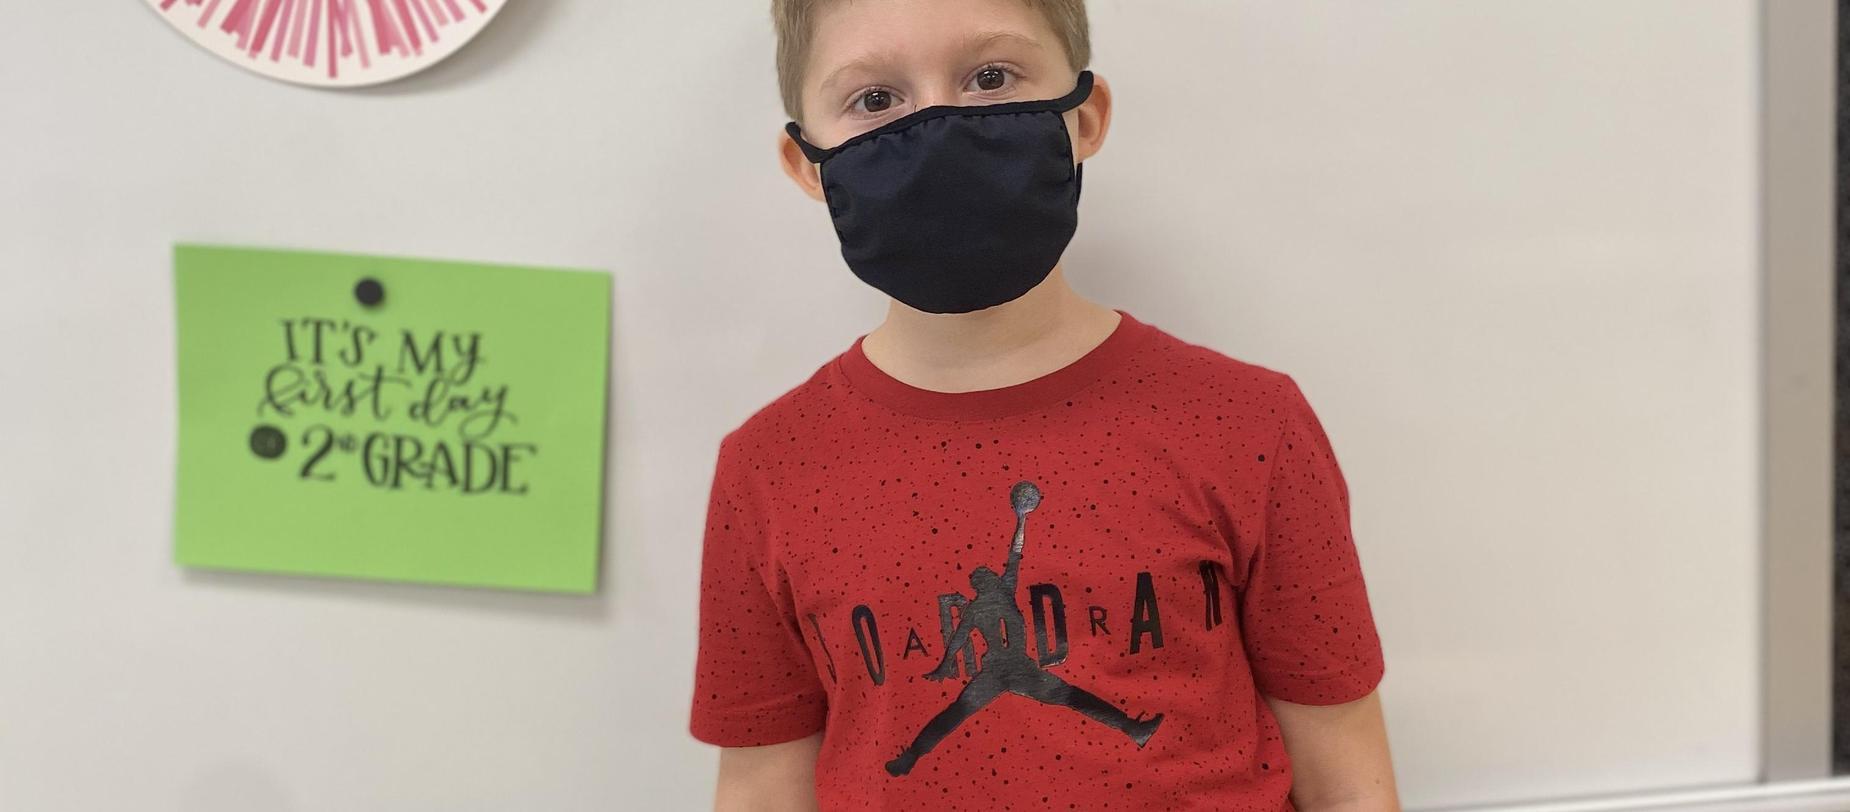 boy wearing a mask